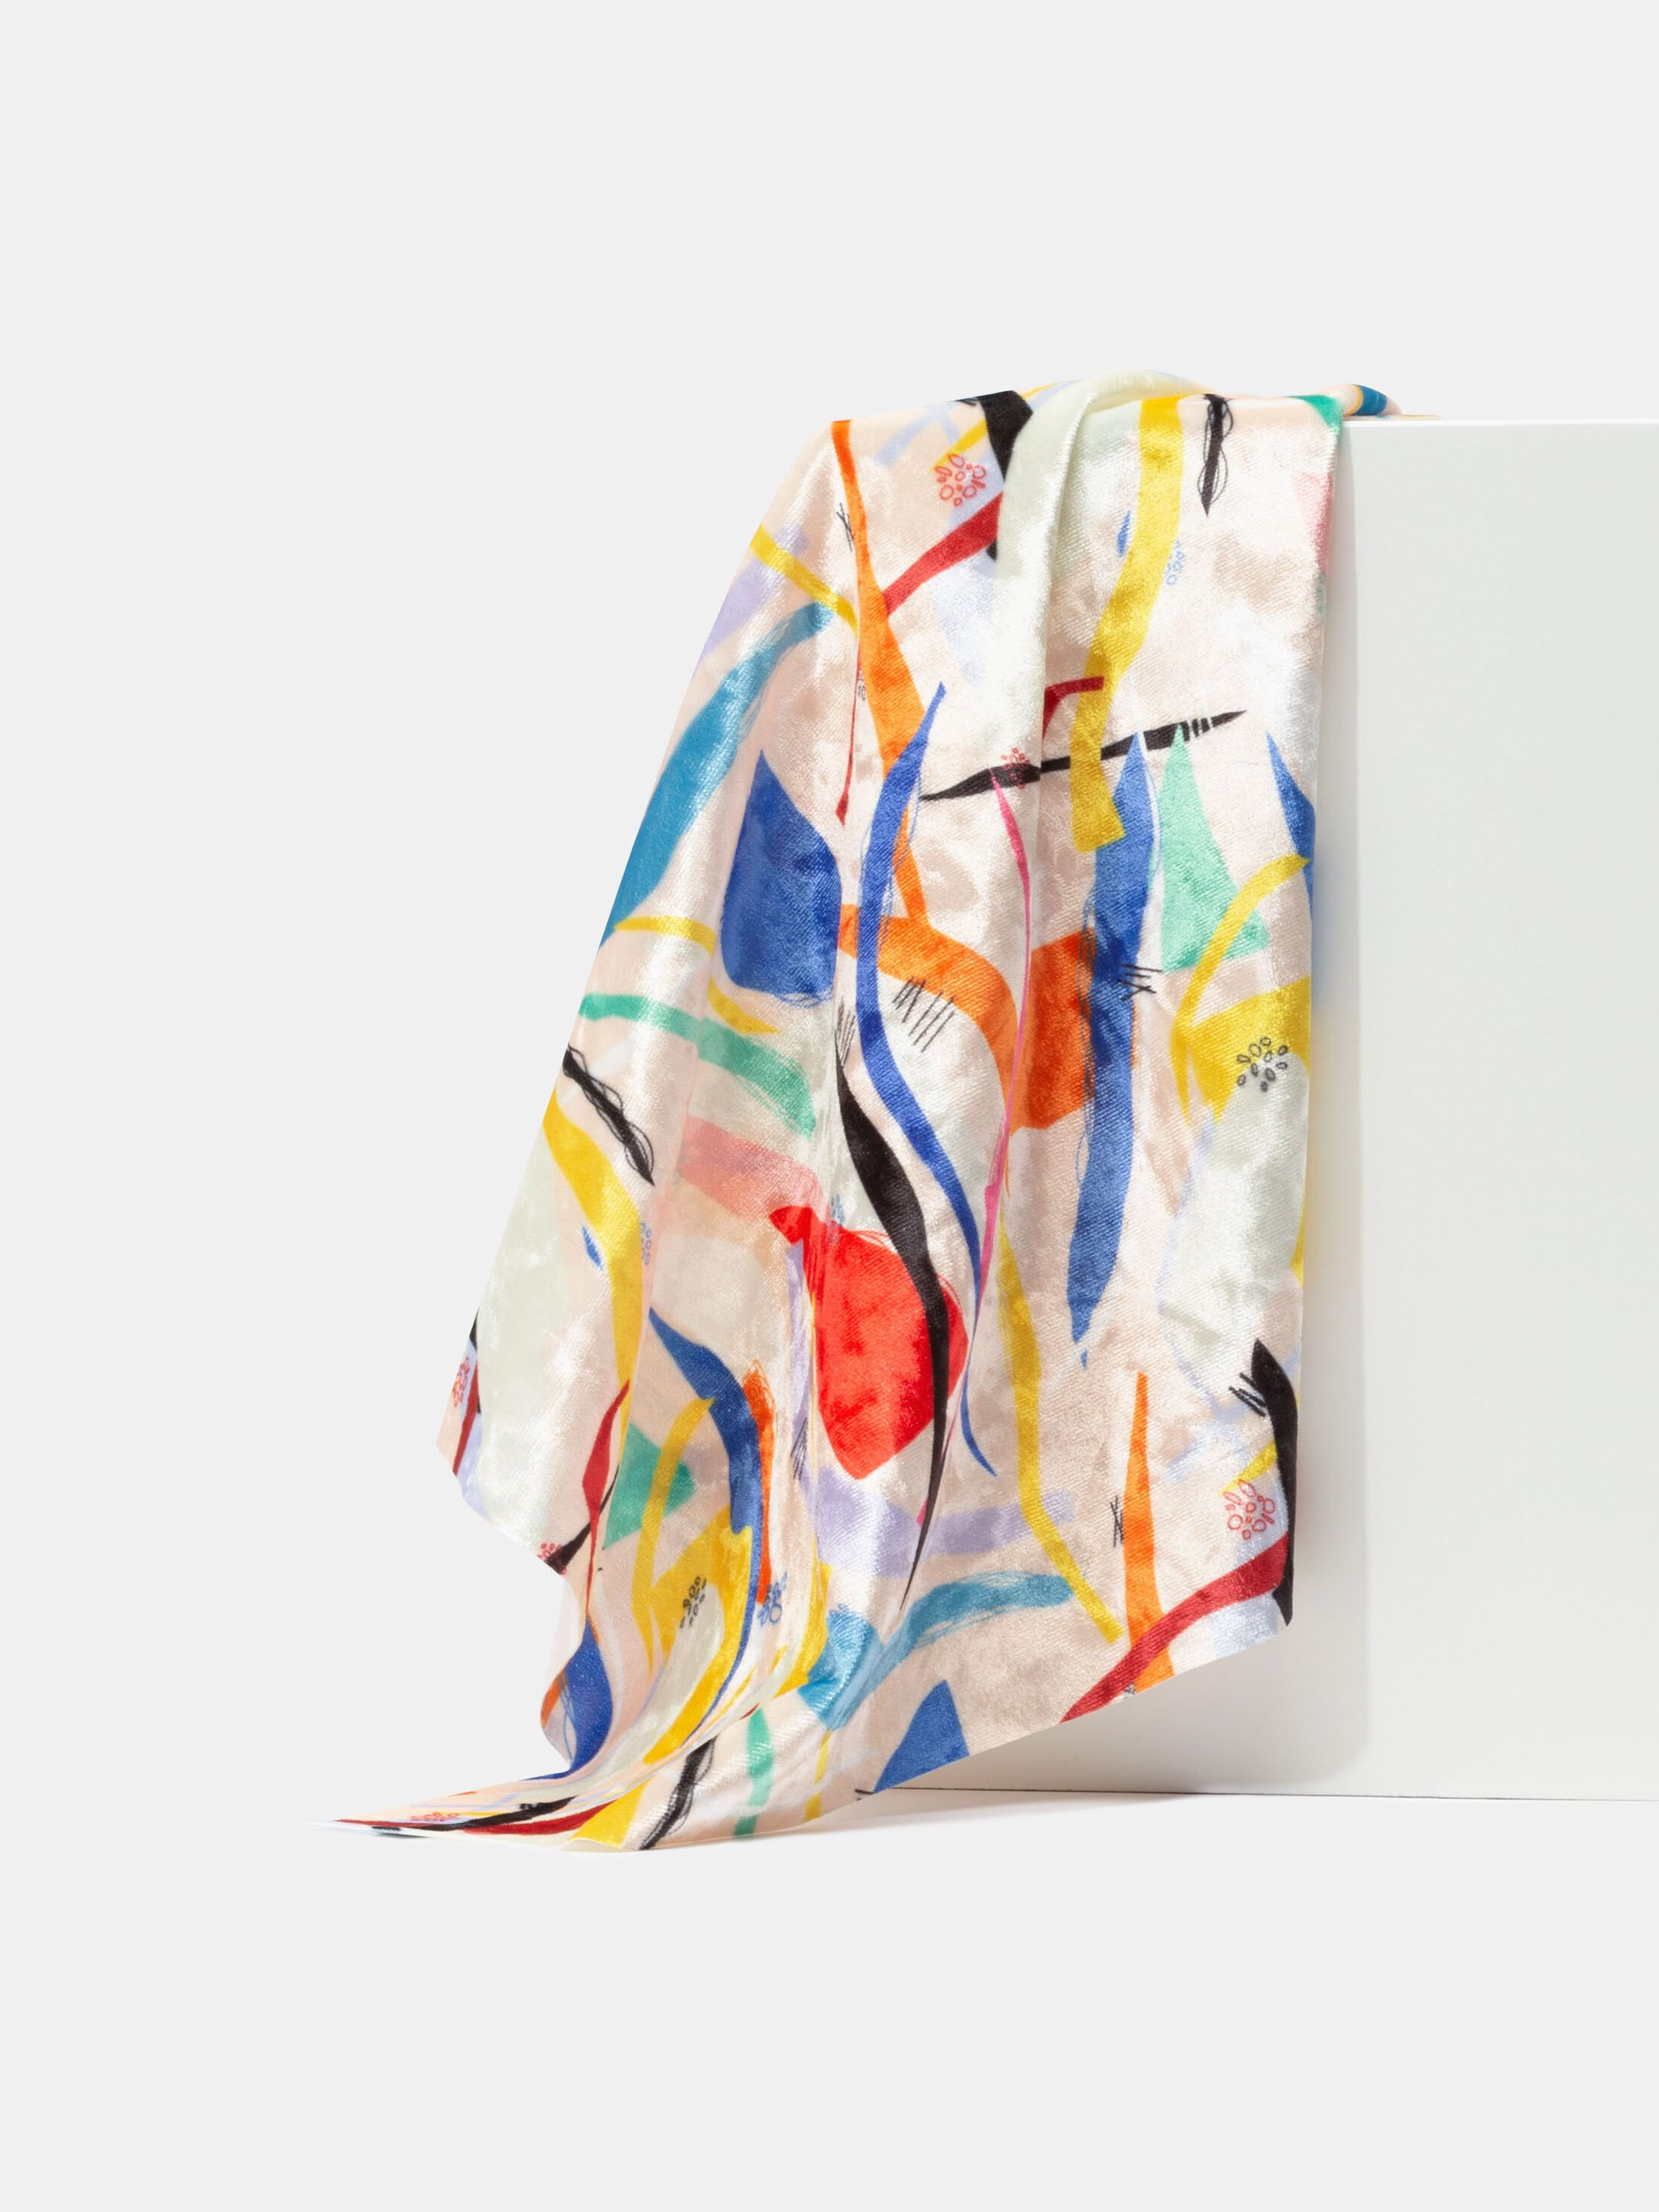 Crushed Velour digital print fabric pattern